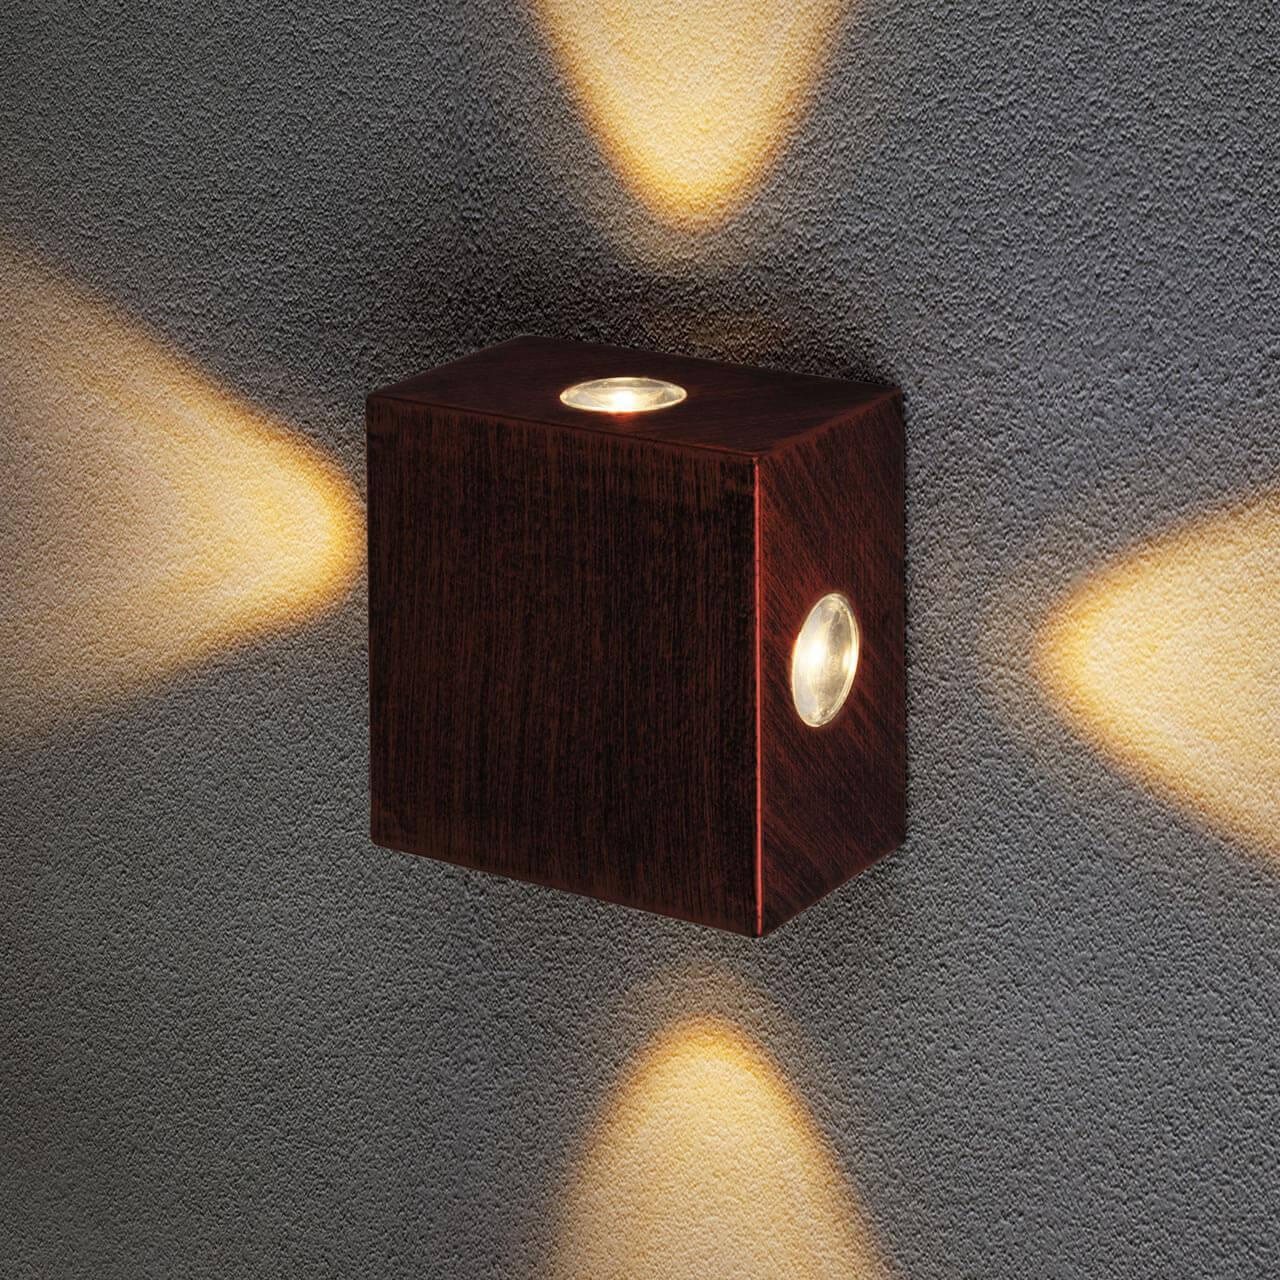 Уличный светильник Elektrostandard 4690389116407, LED уличный настенный светодиодный светильник elektrostandard 1605 techno led sokar графит 4690389086038